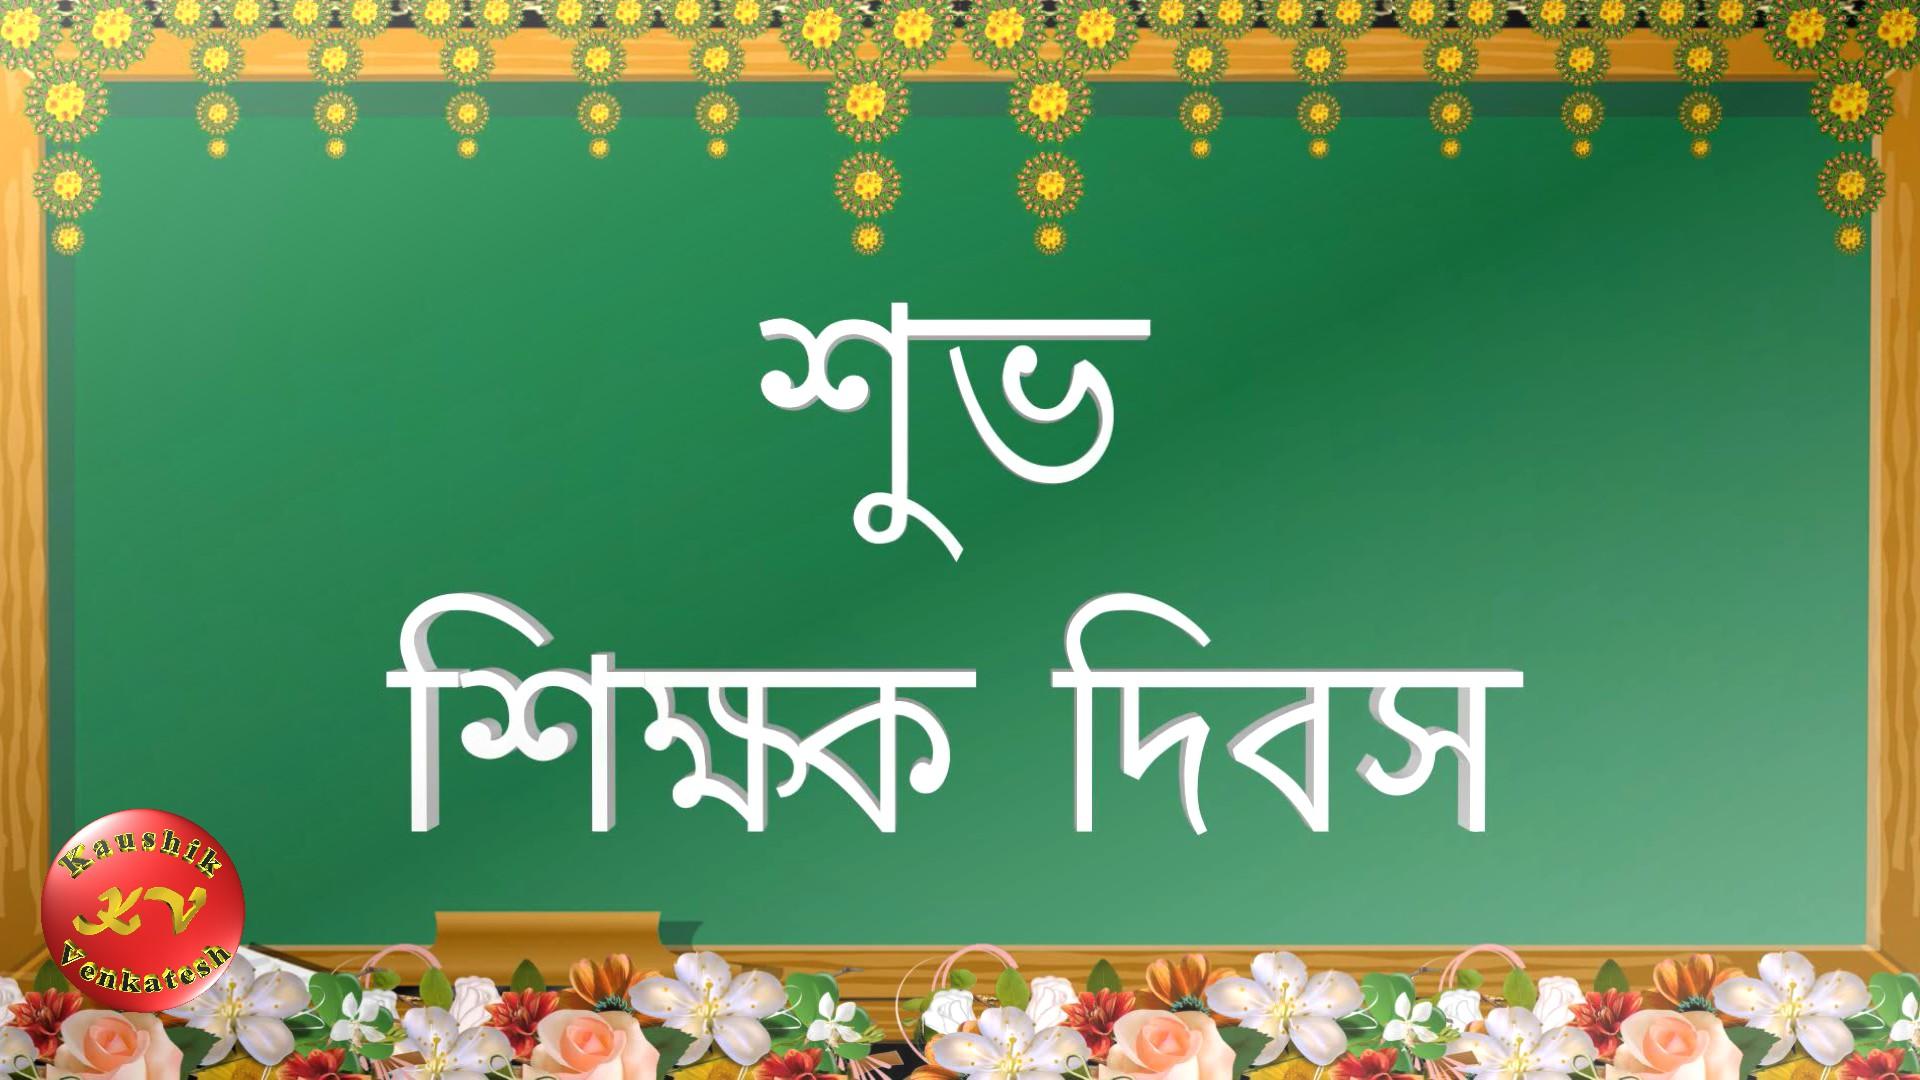 Greetings Image for September 5th (Teacher's Day) in Bengali